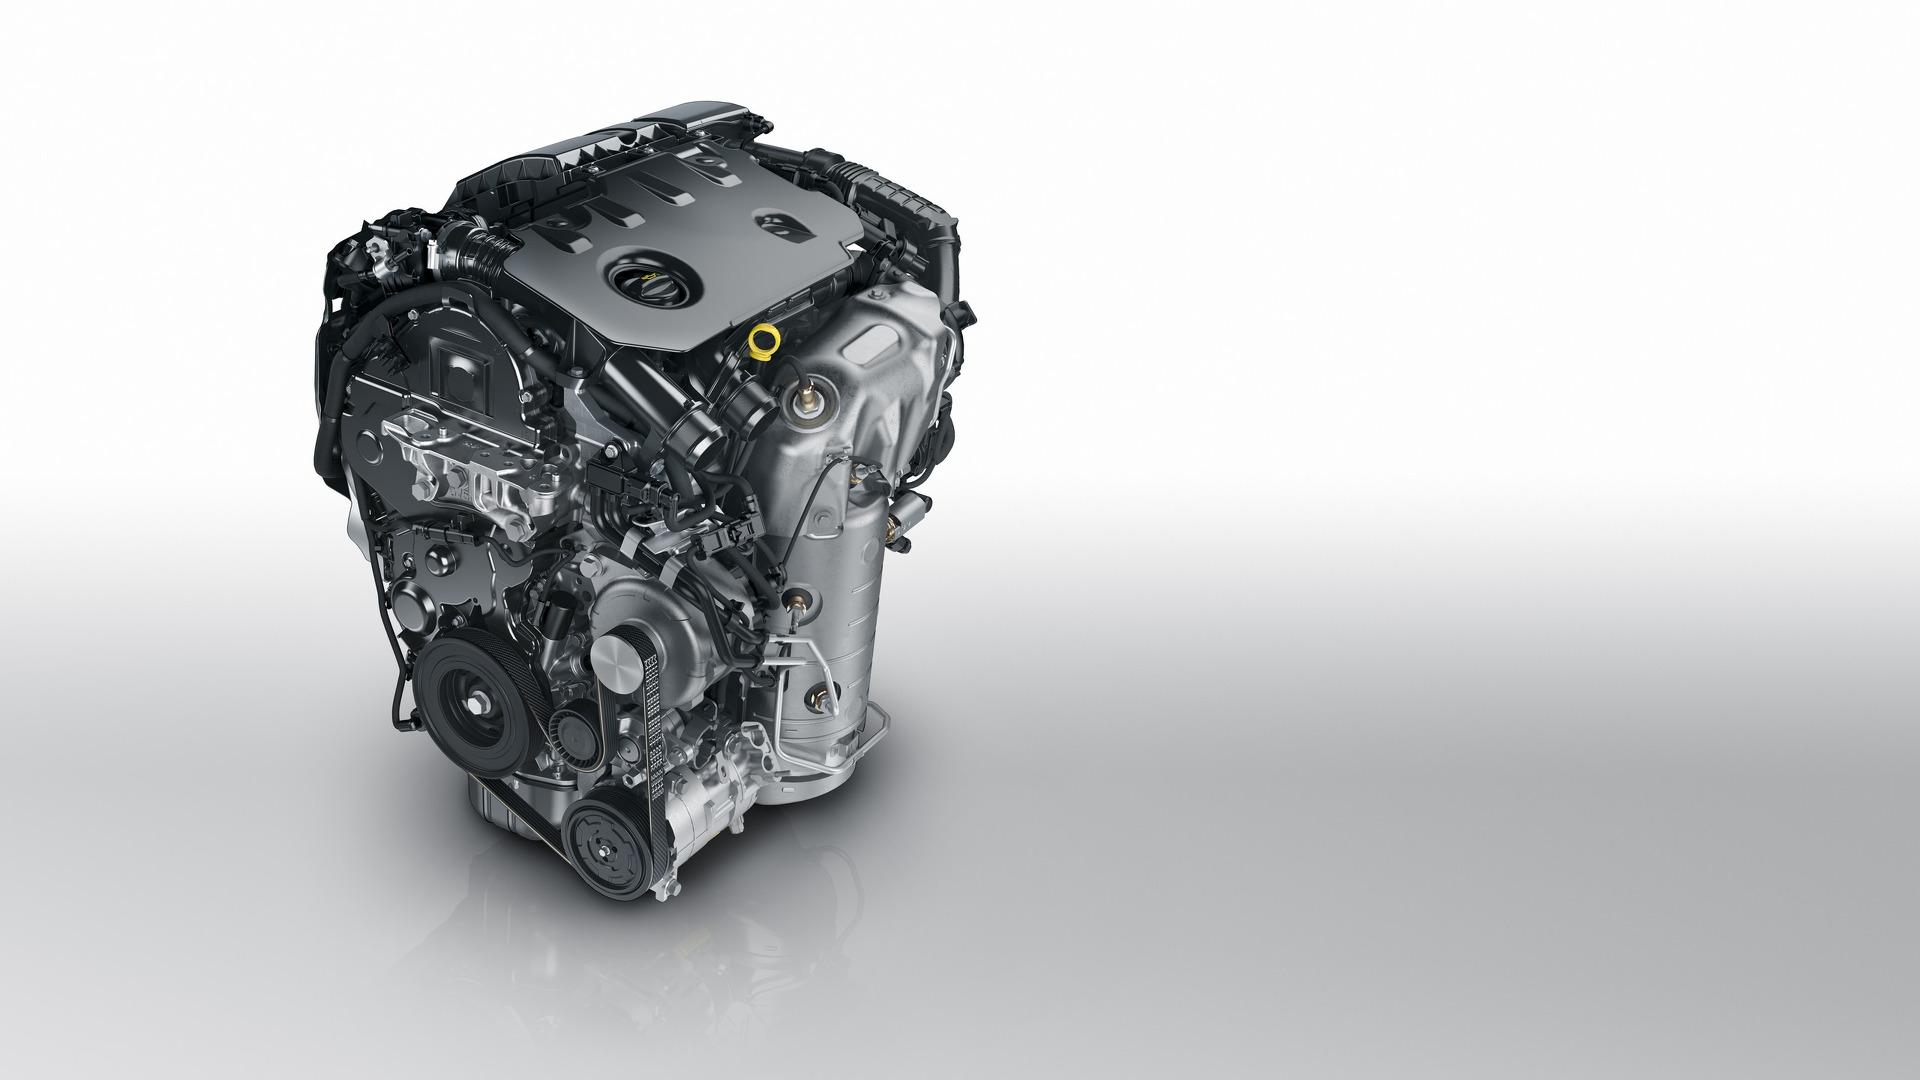 2018-peugeot-308-facelift (8)